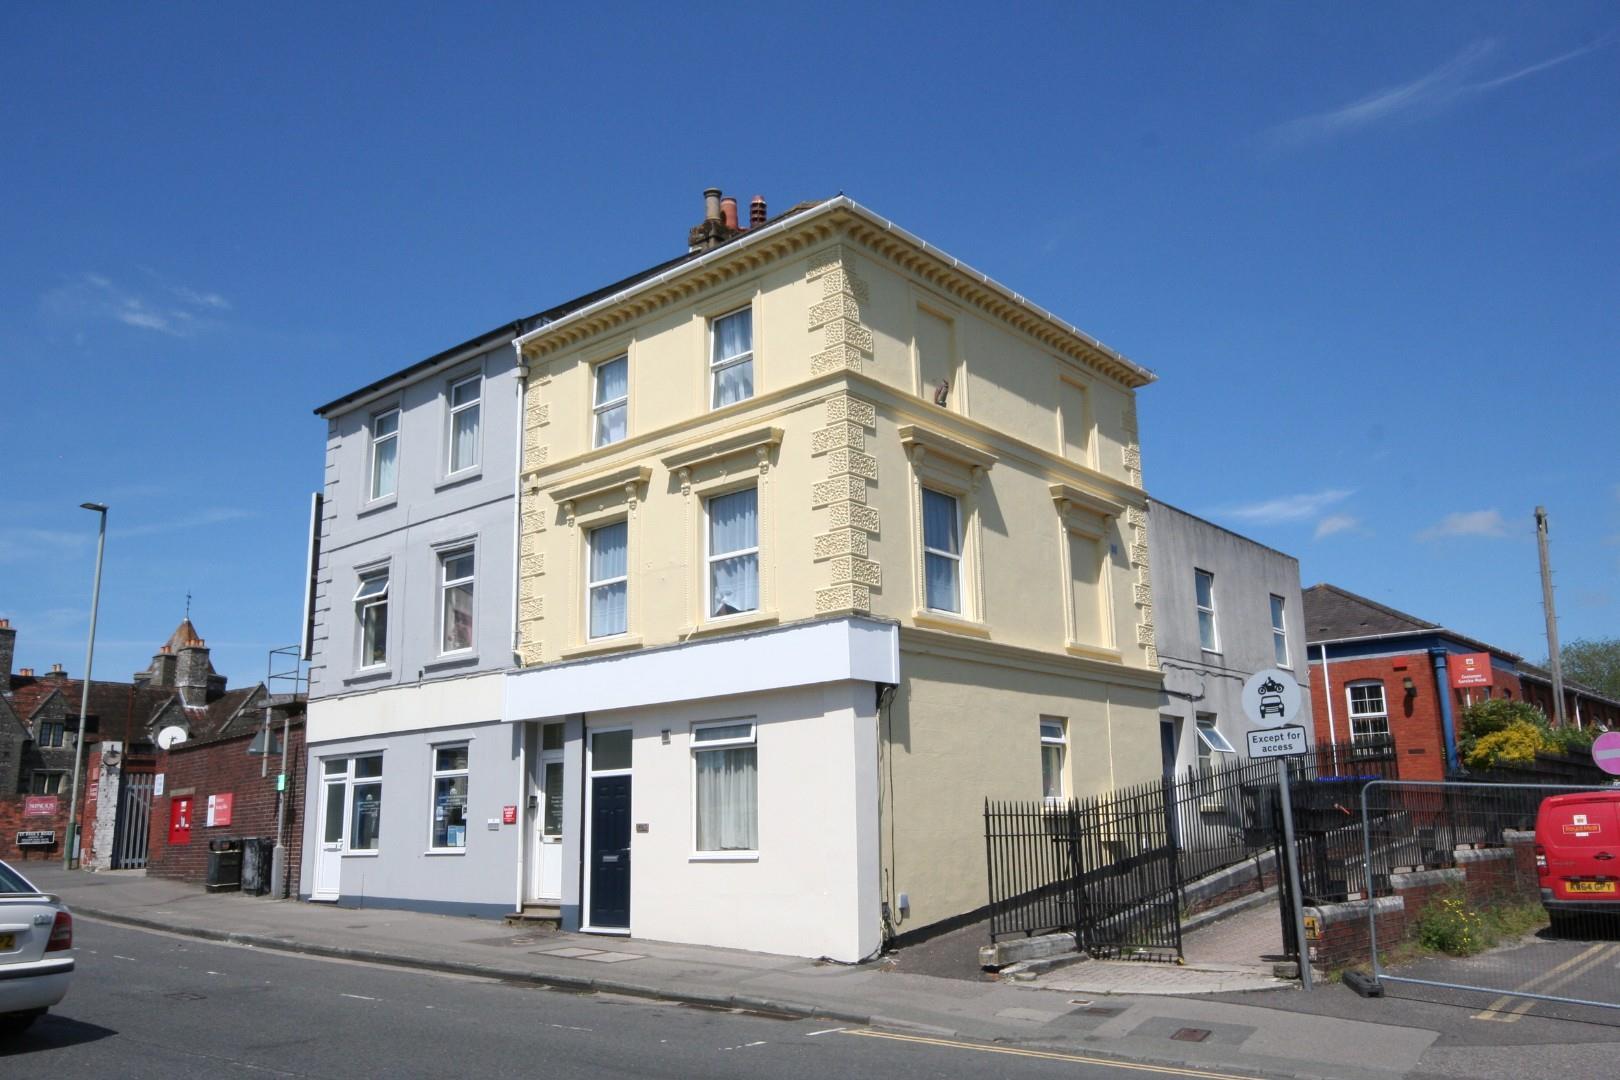 Fisherton Street, Salisbury